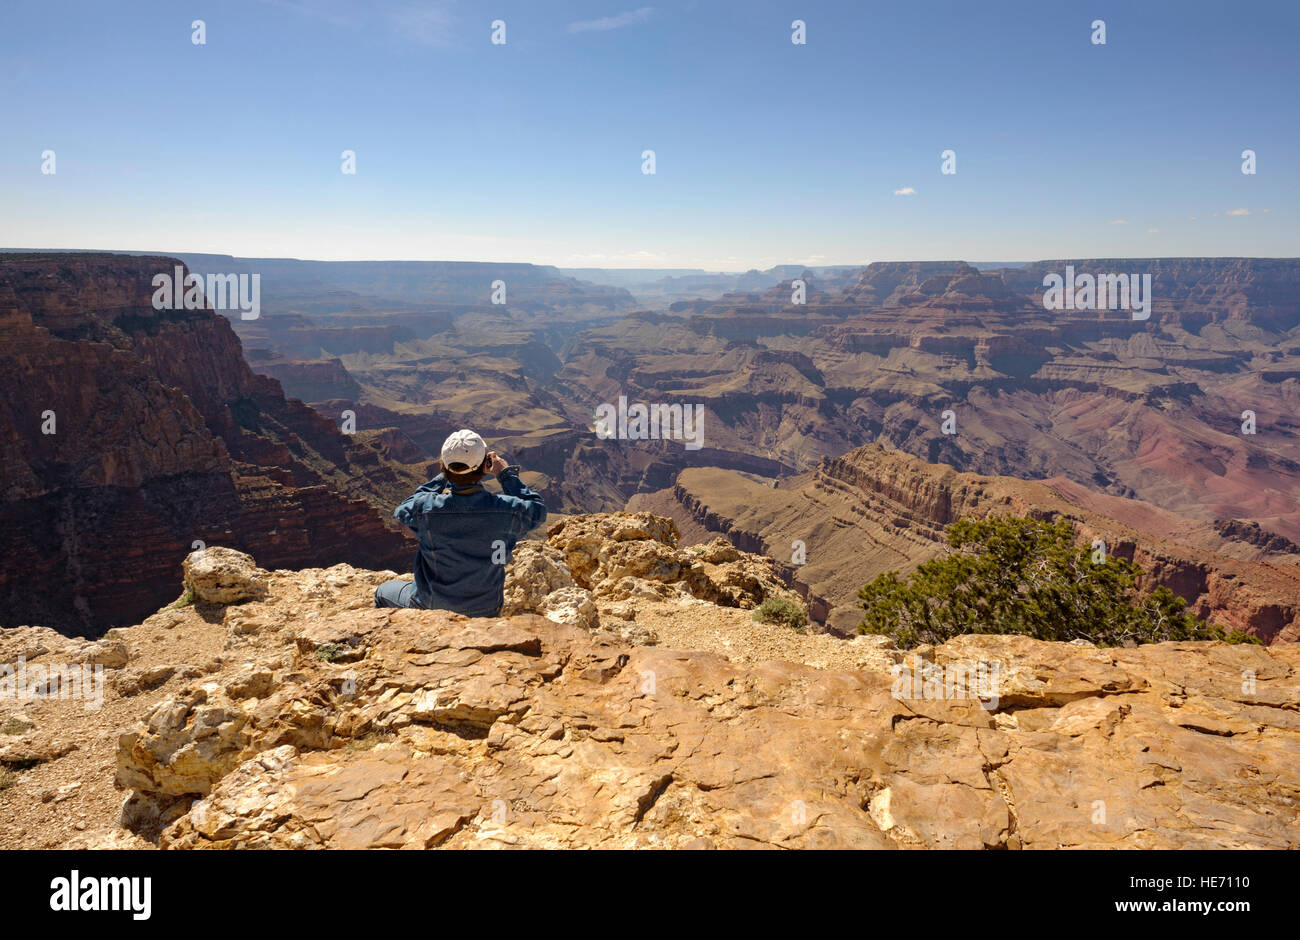 adventure-travel-man-at-edge-of-the-grand-canyon-south-rim-pipe-creek-HE7110.jpg